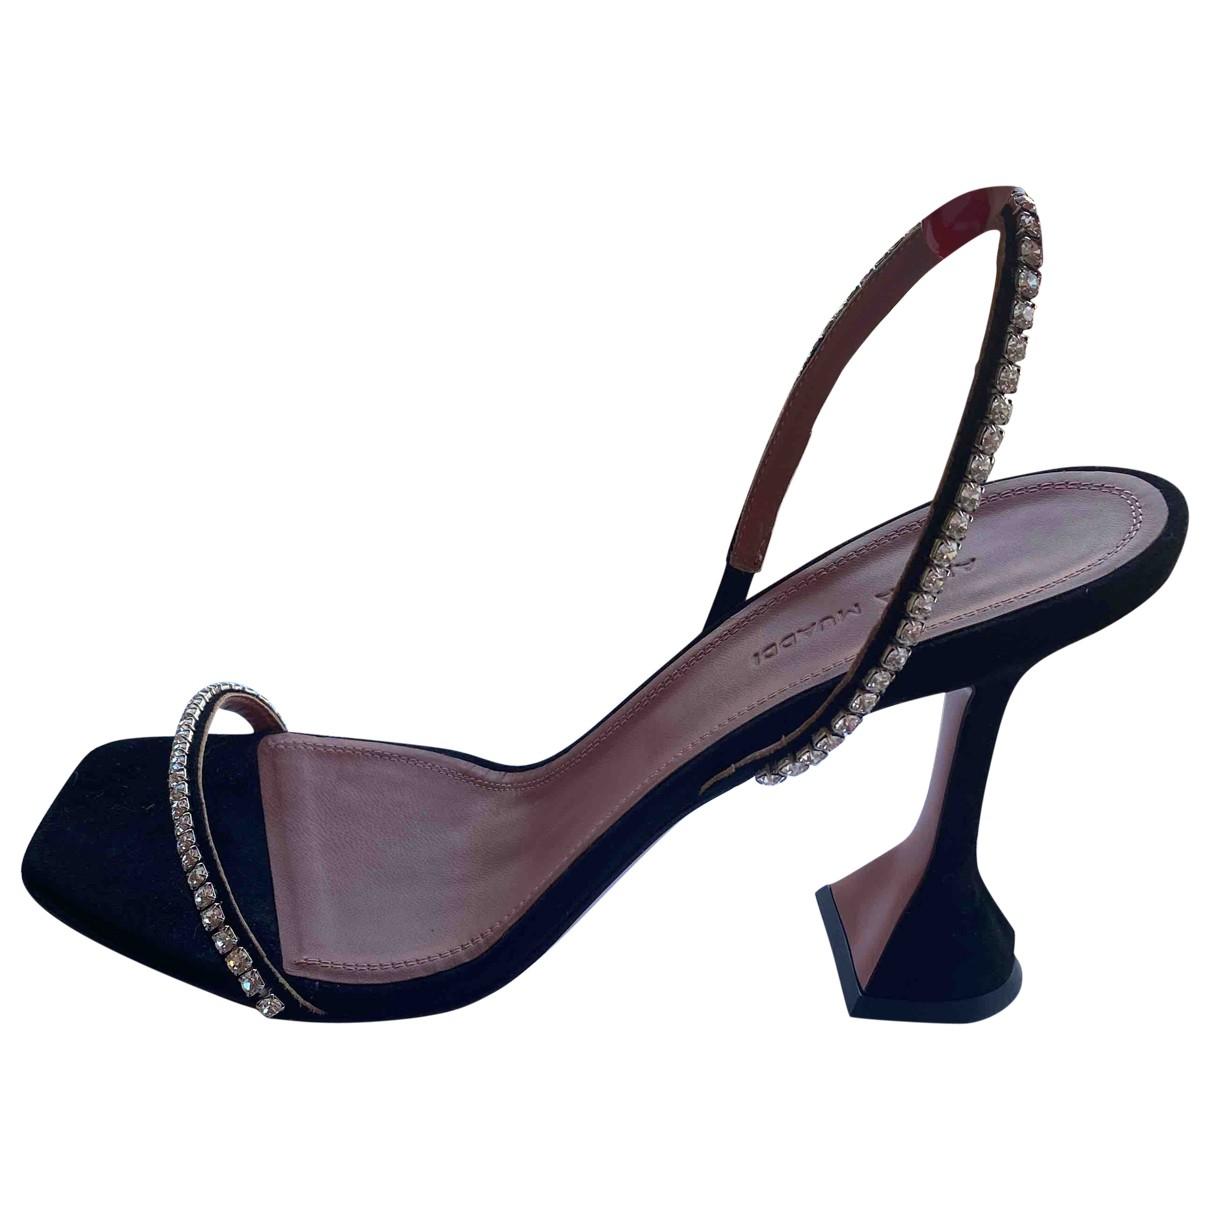 Amina Muaddi Gilda Black Suede Sandals for Women 41 EU